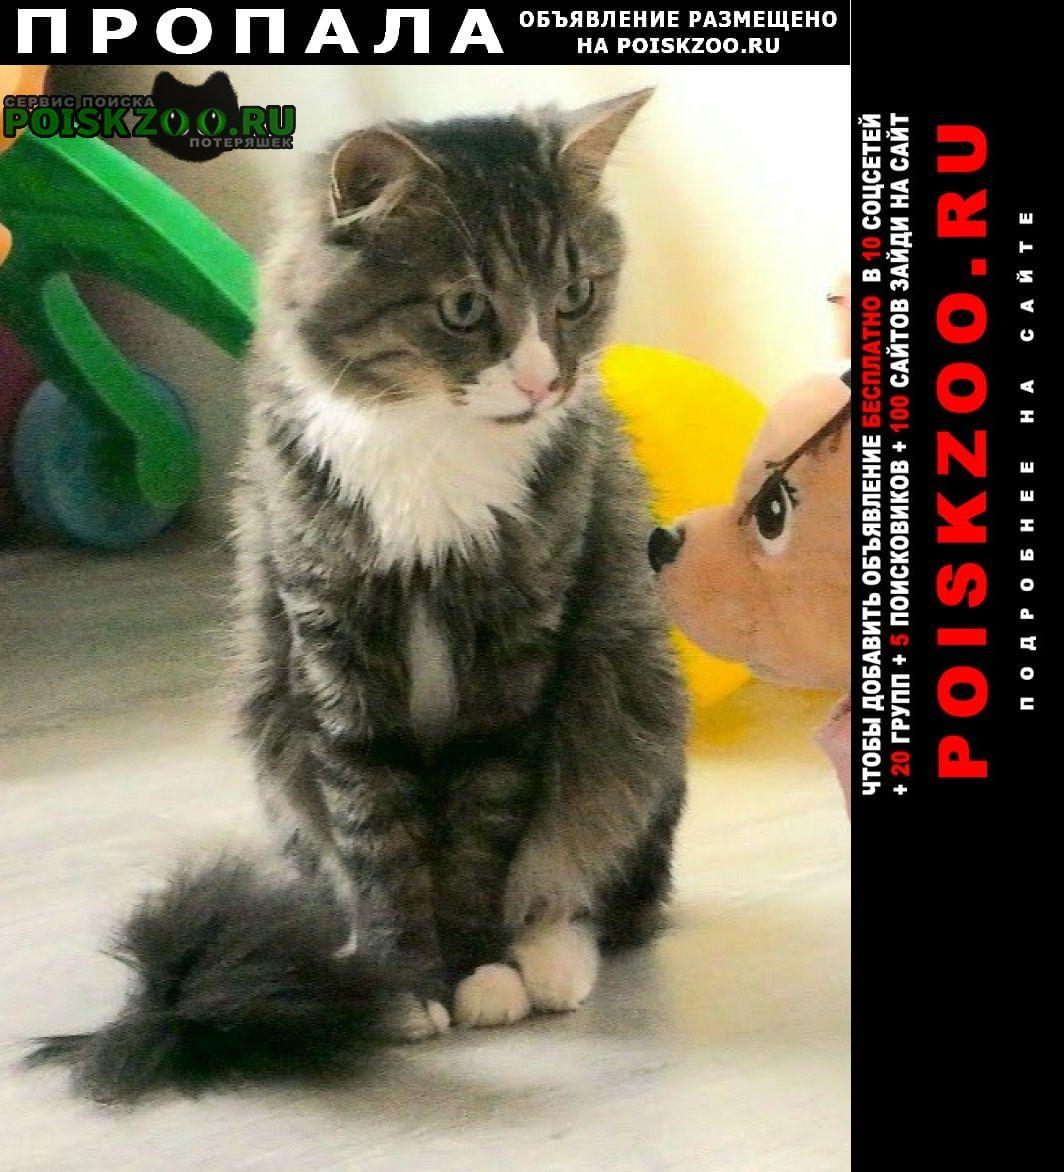 Пропал кот юзао Москва